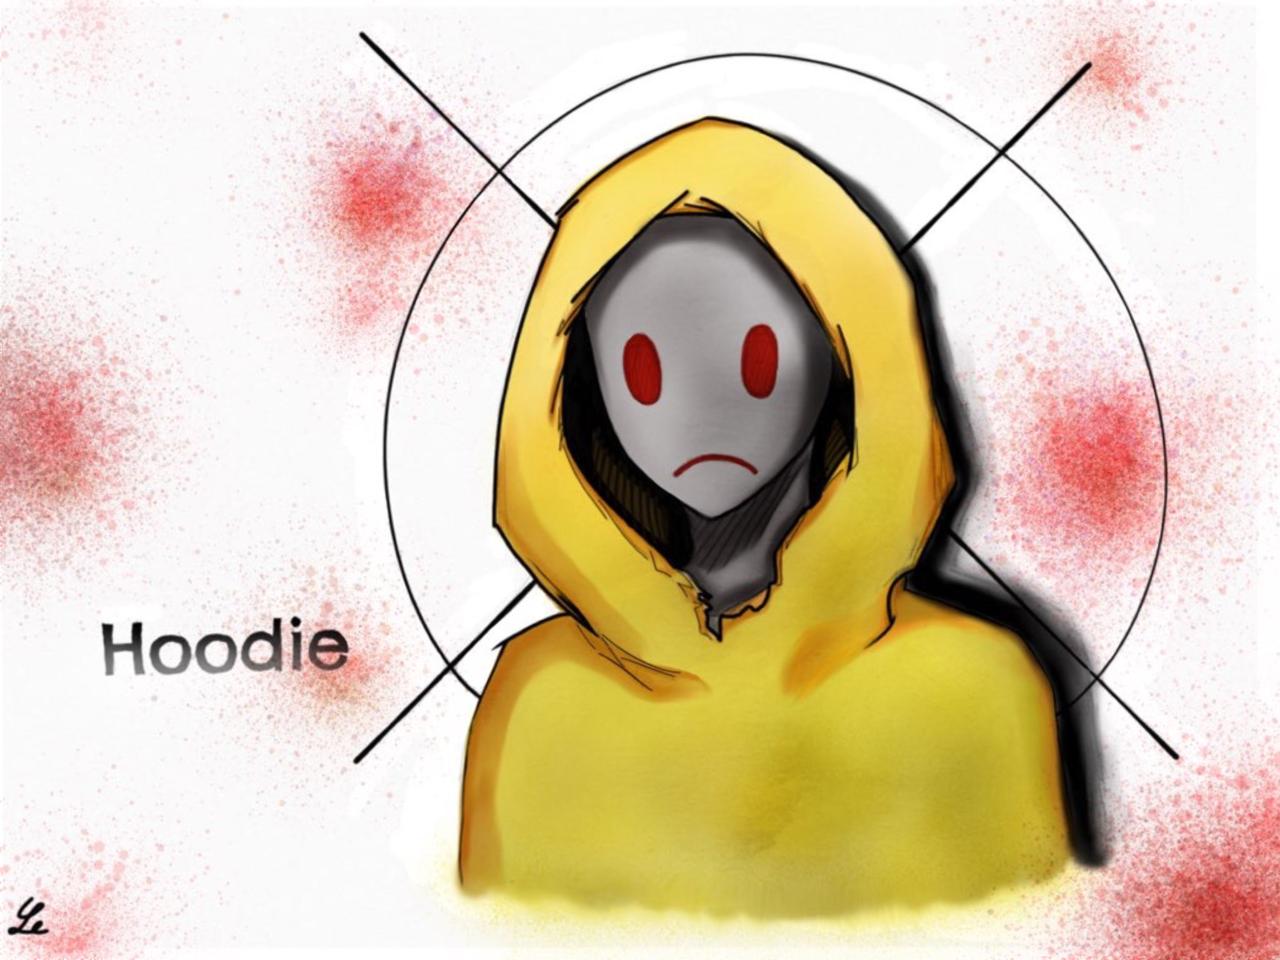 Hoodie Creepypasta